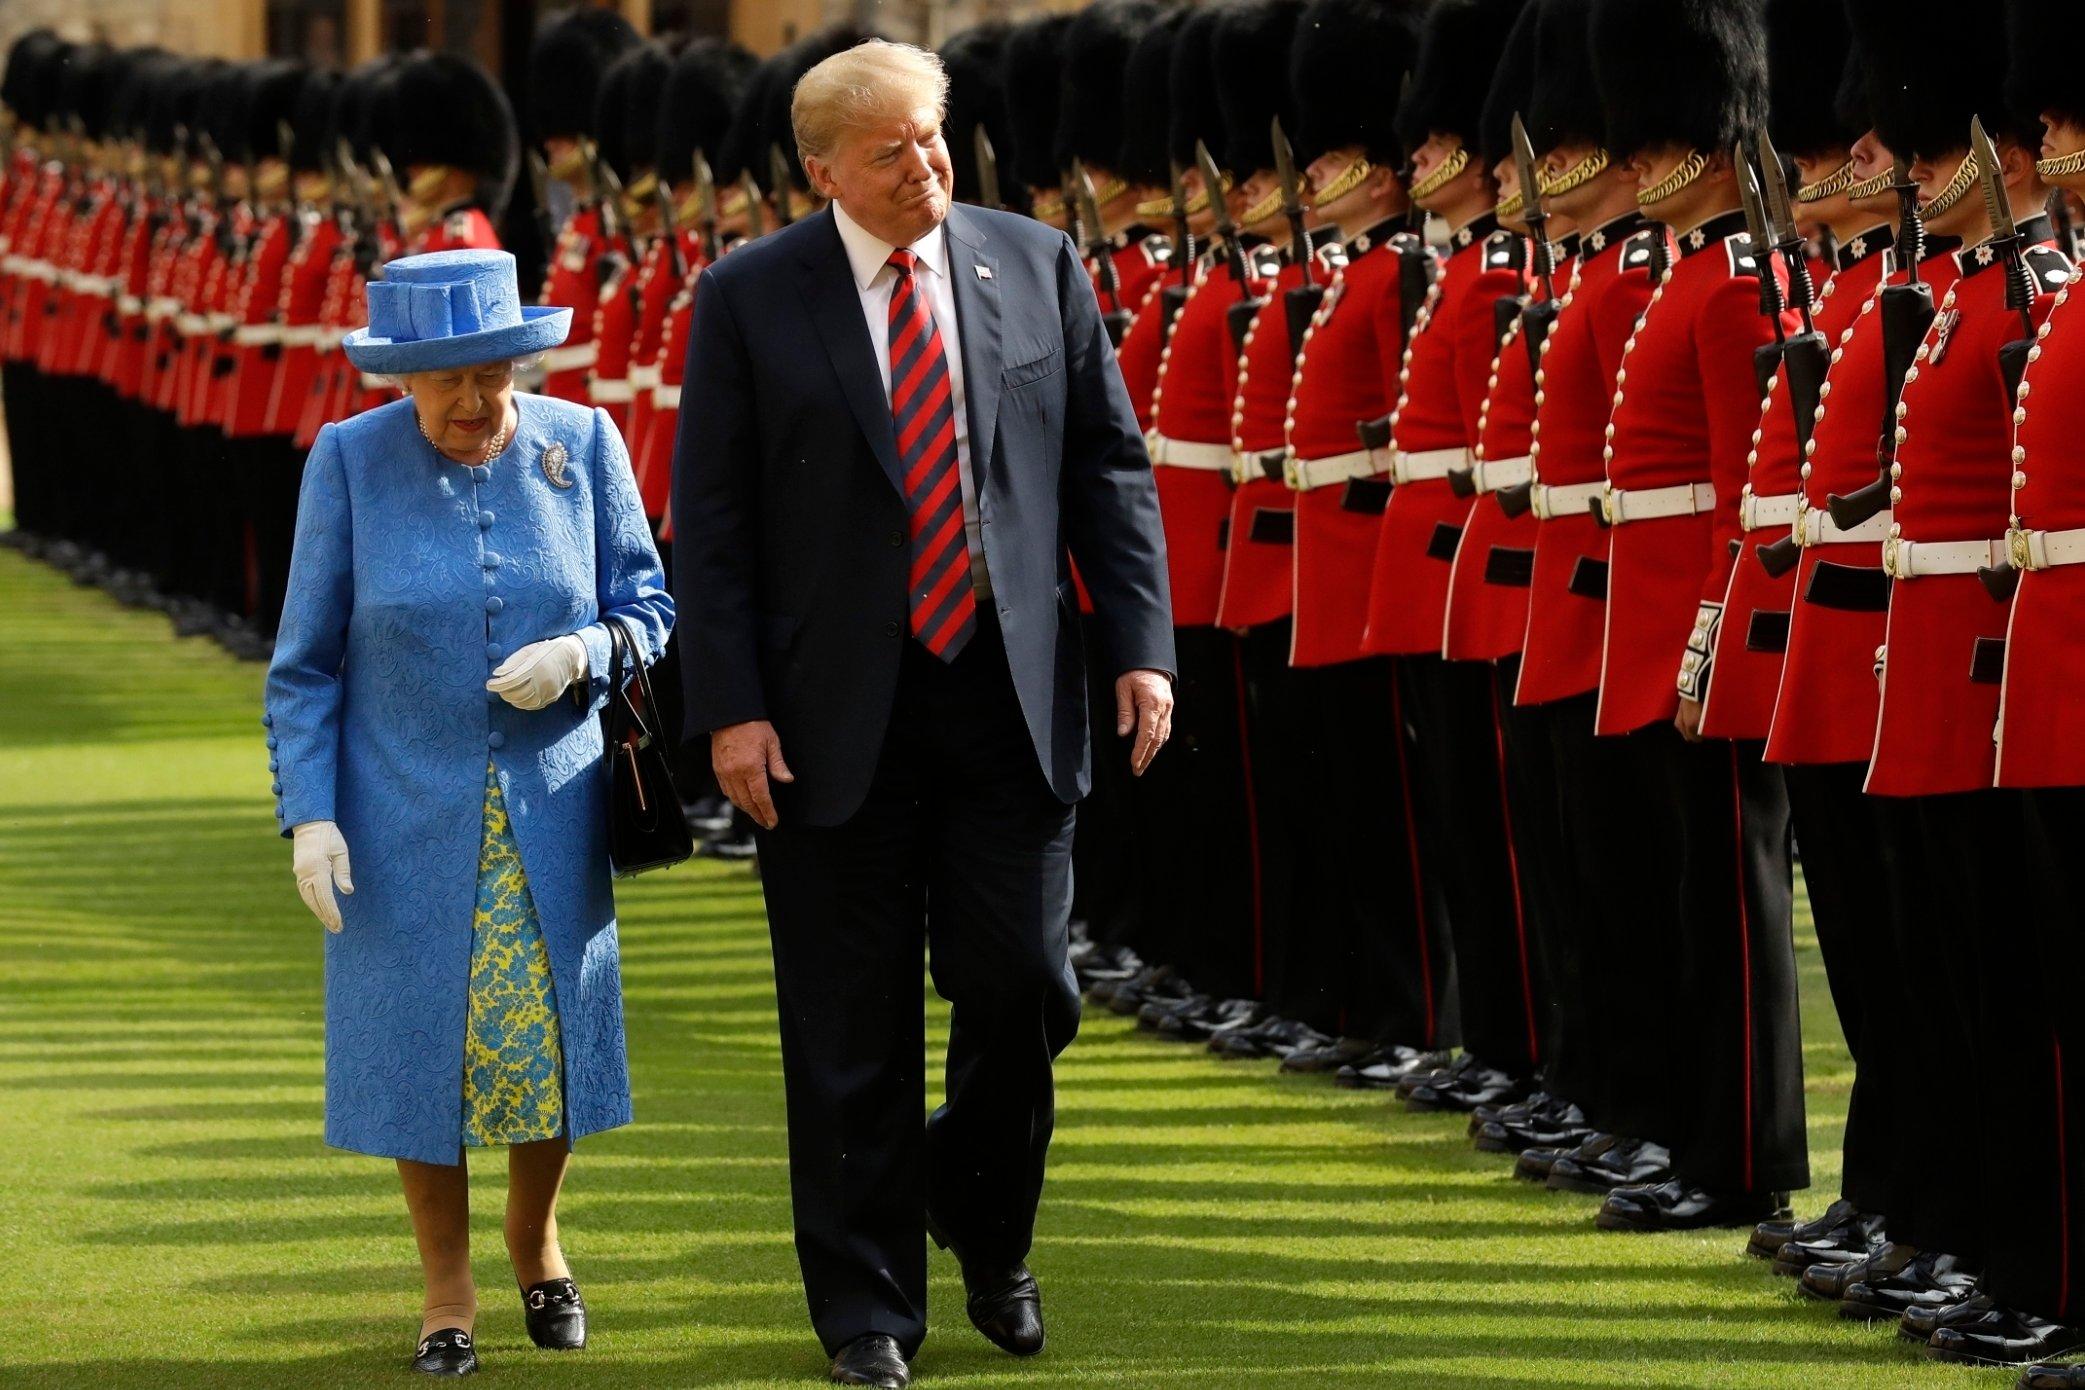 Donald Trump standing in front of the queen